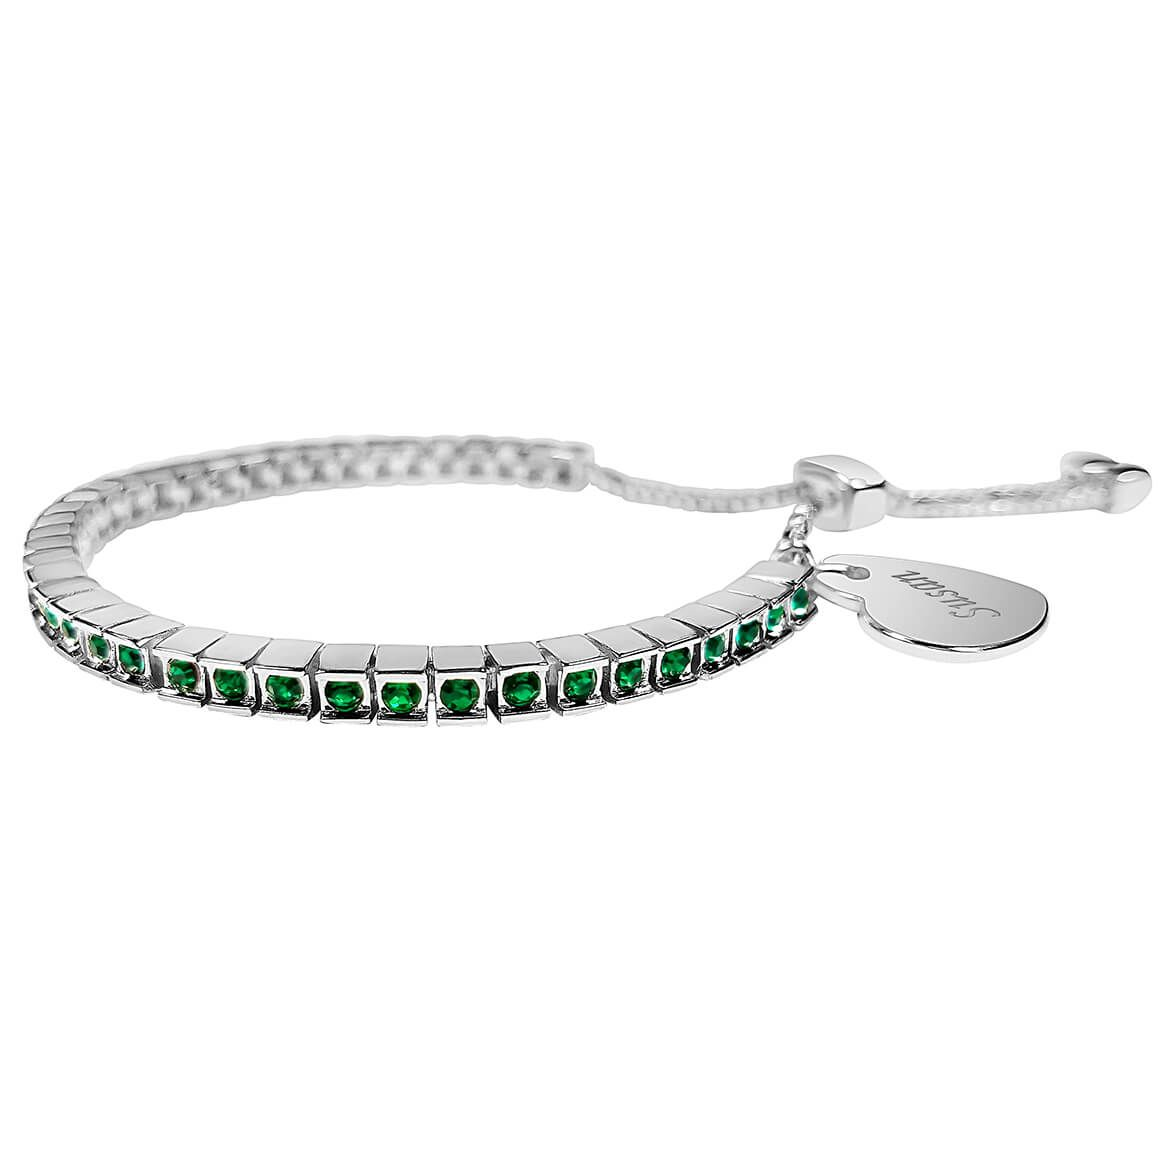 Personalized Birthstone Crystal Slide Bracelet-362421